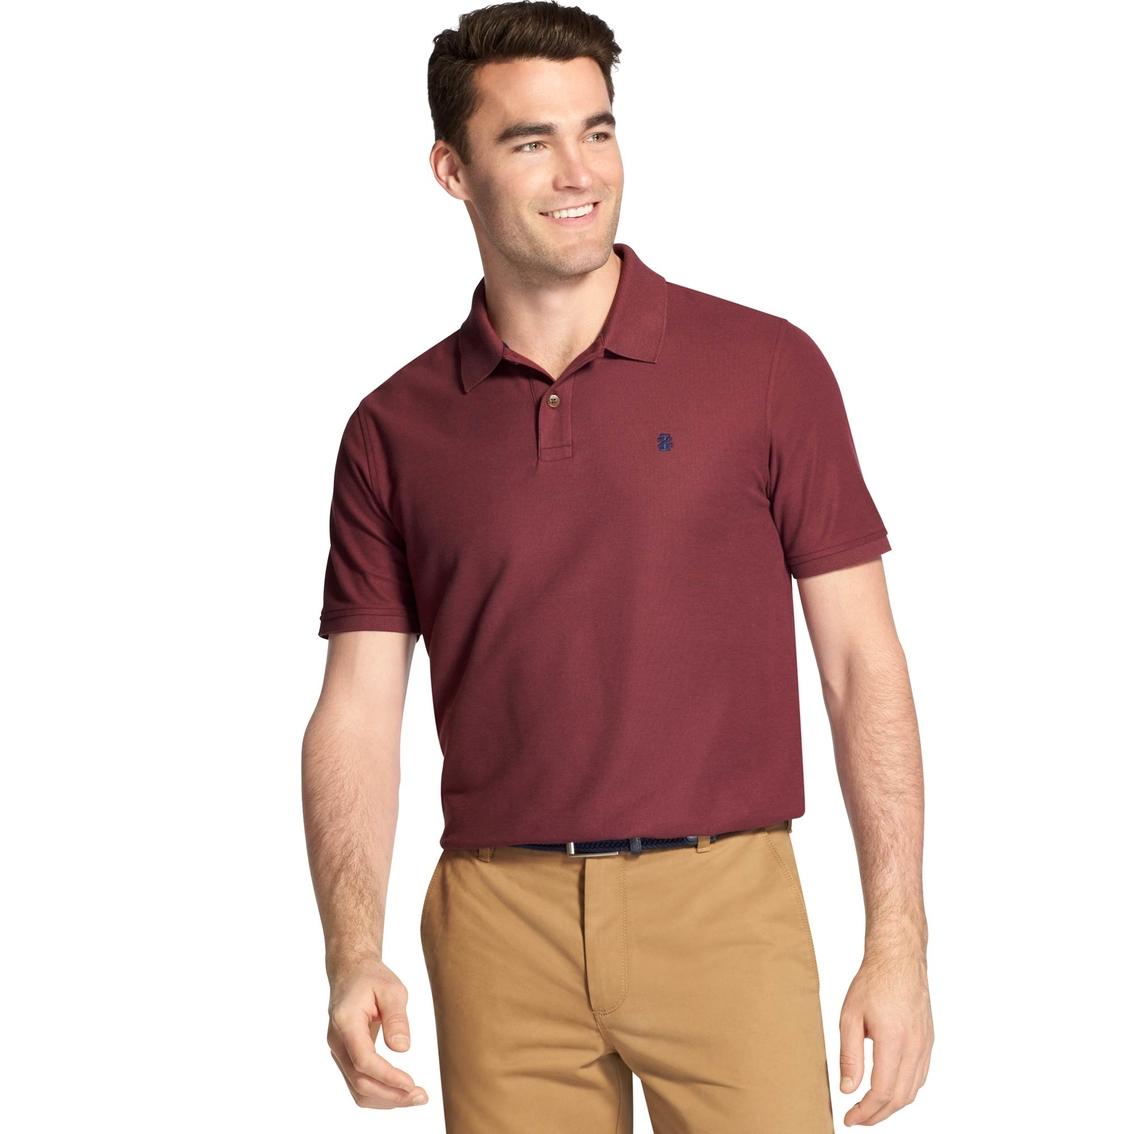 863078de Izod Advantage Polo Shirt | Polos | Apparel | Shop The Exchange